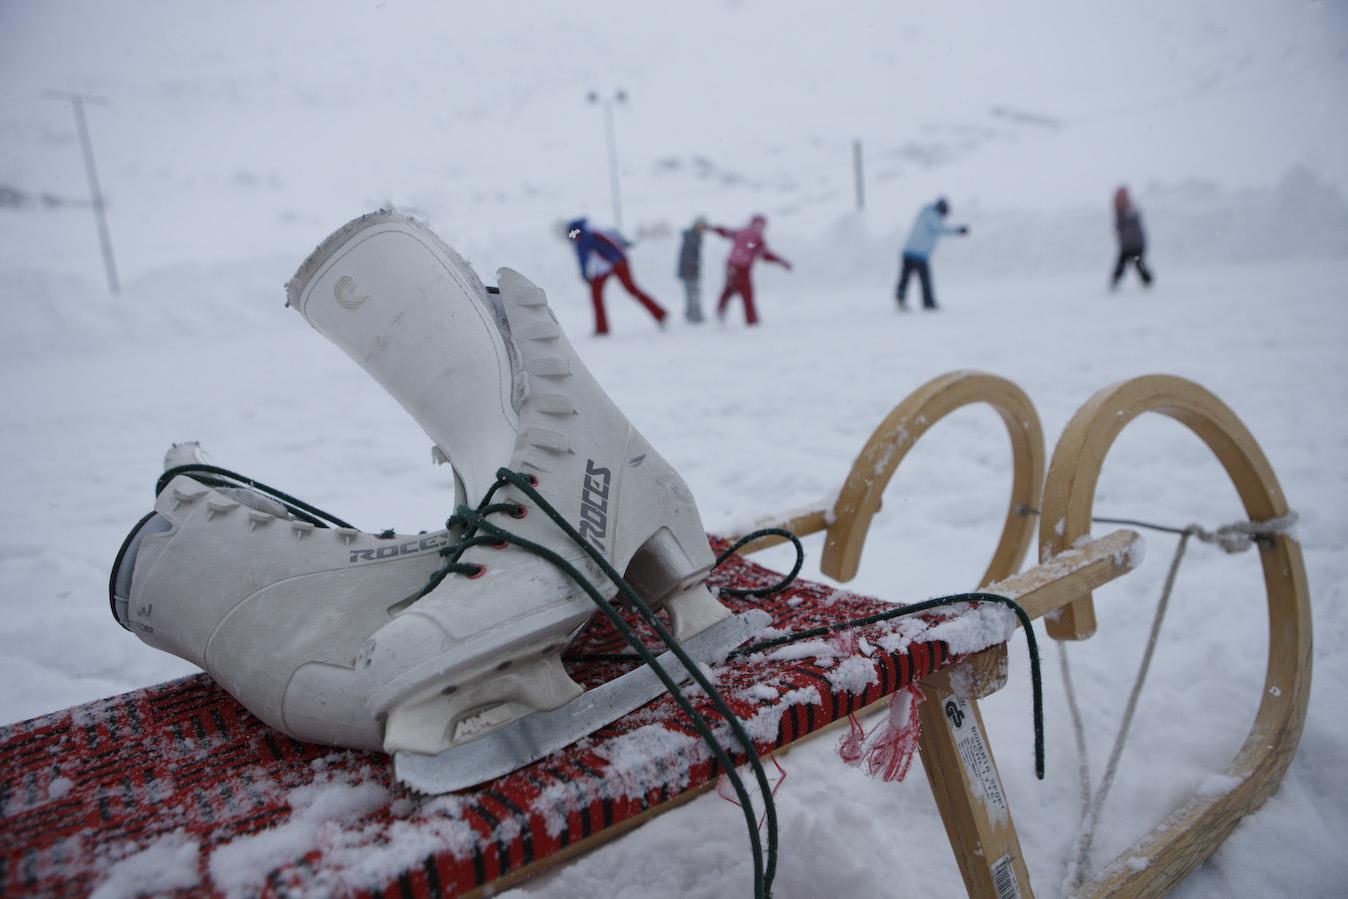 Natural ice rink in Plan/Pfelders in the Passeier Valley